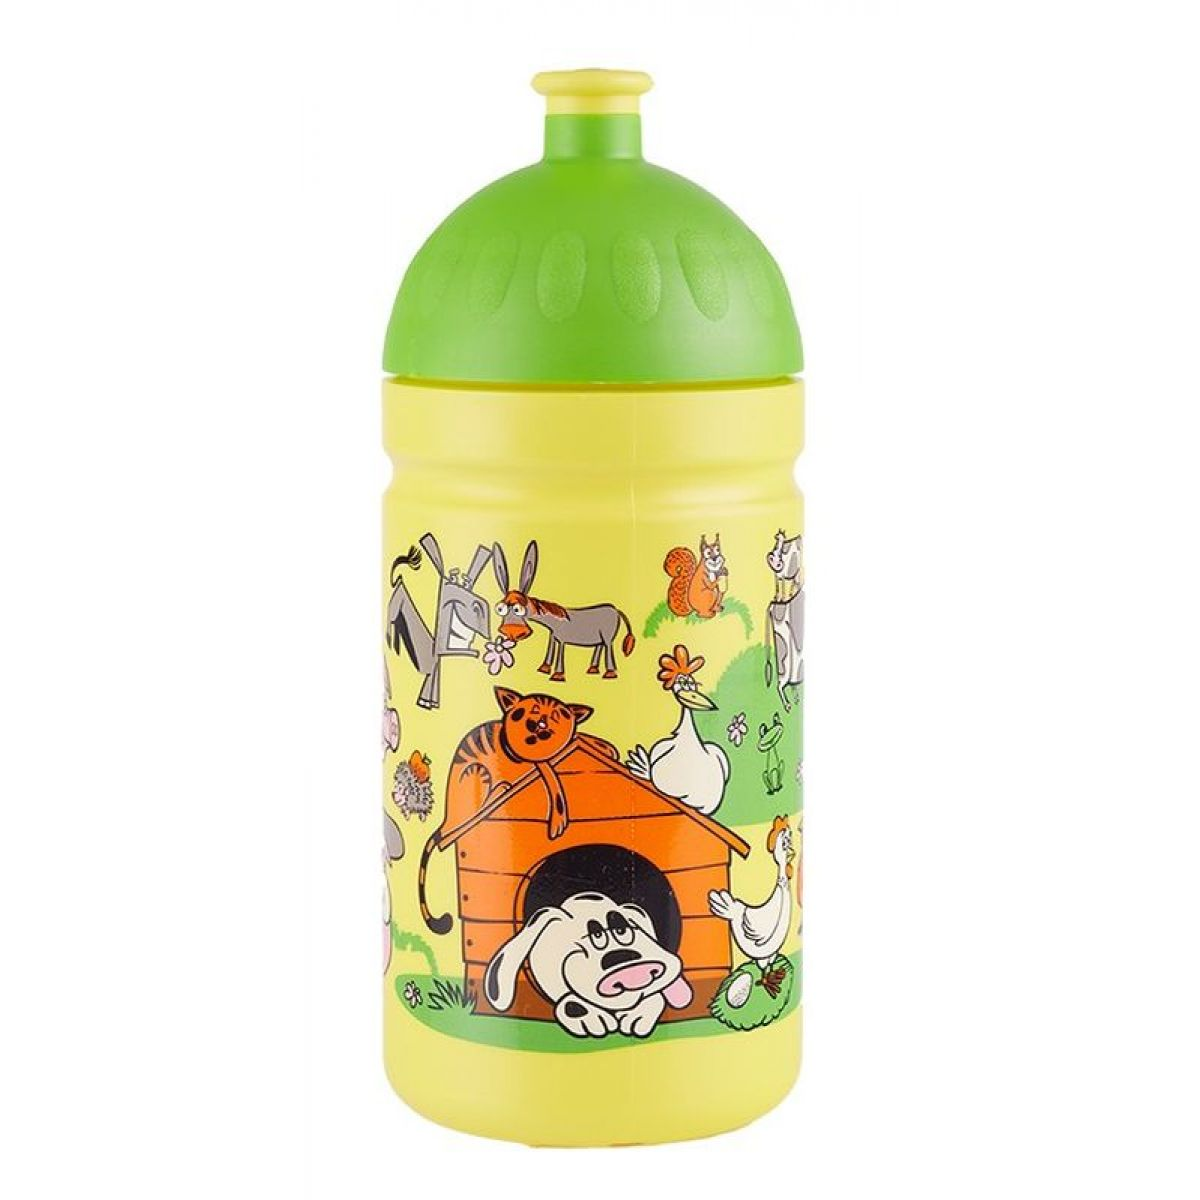 Zdravá lahev Veselý dvorek 500ml